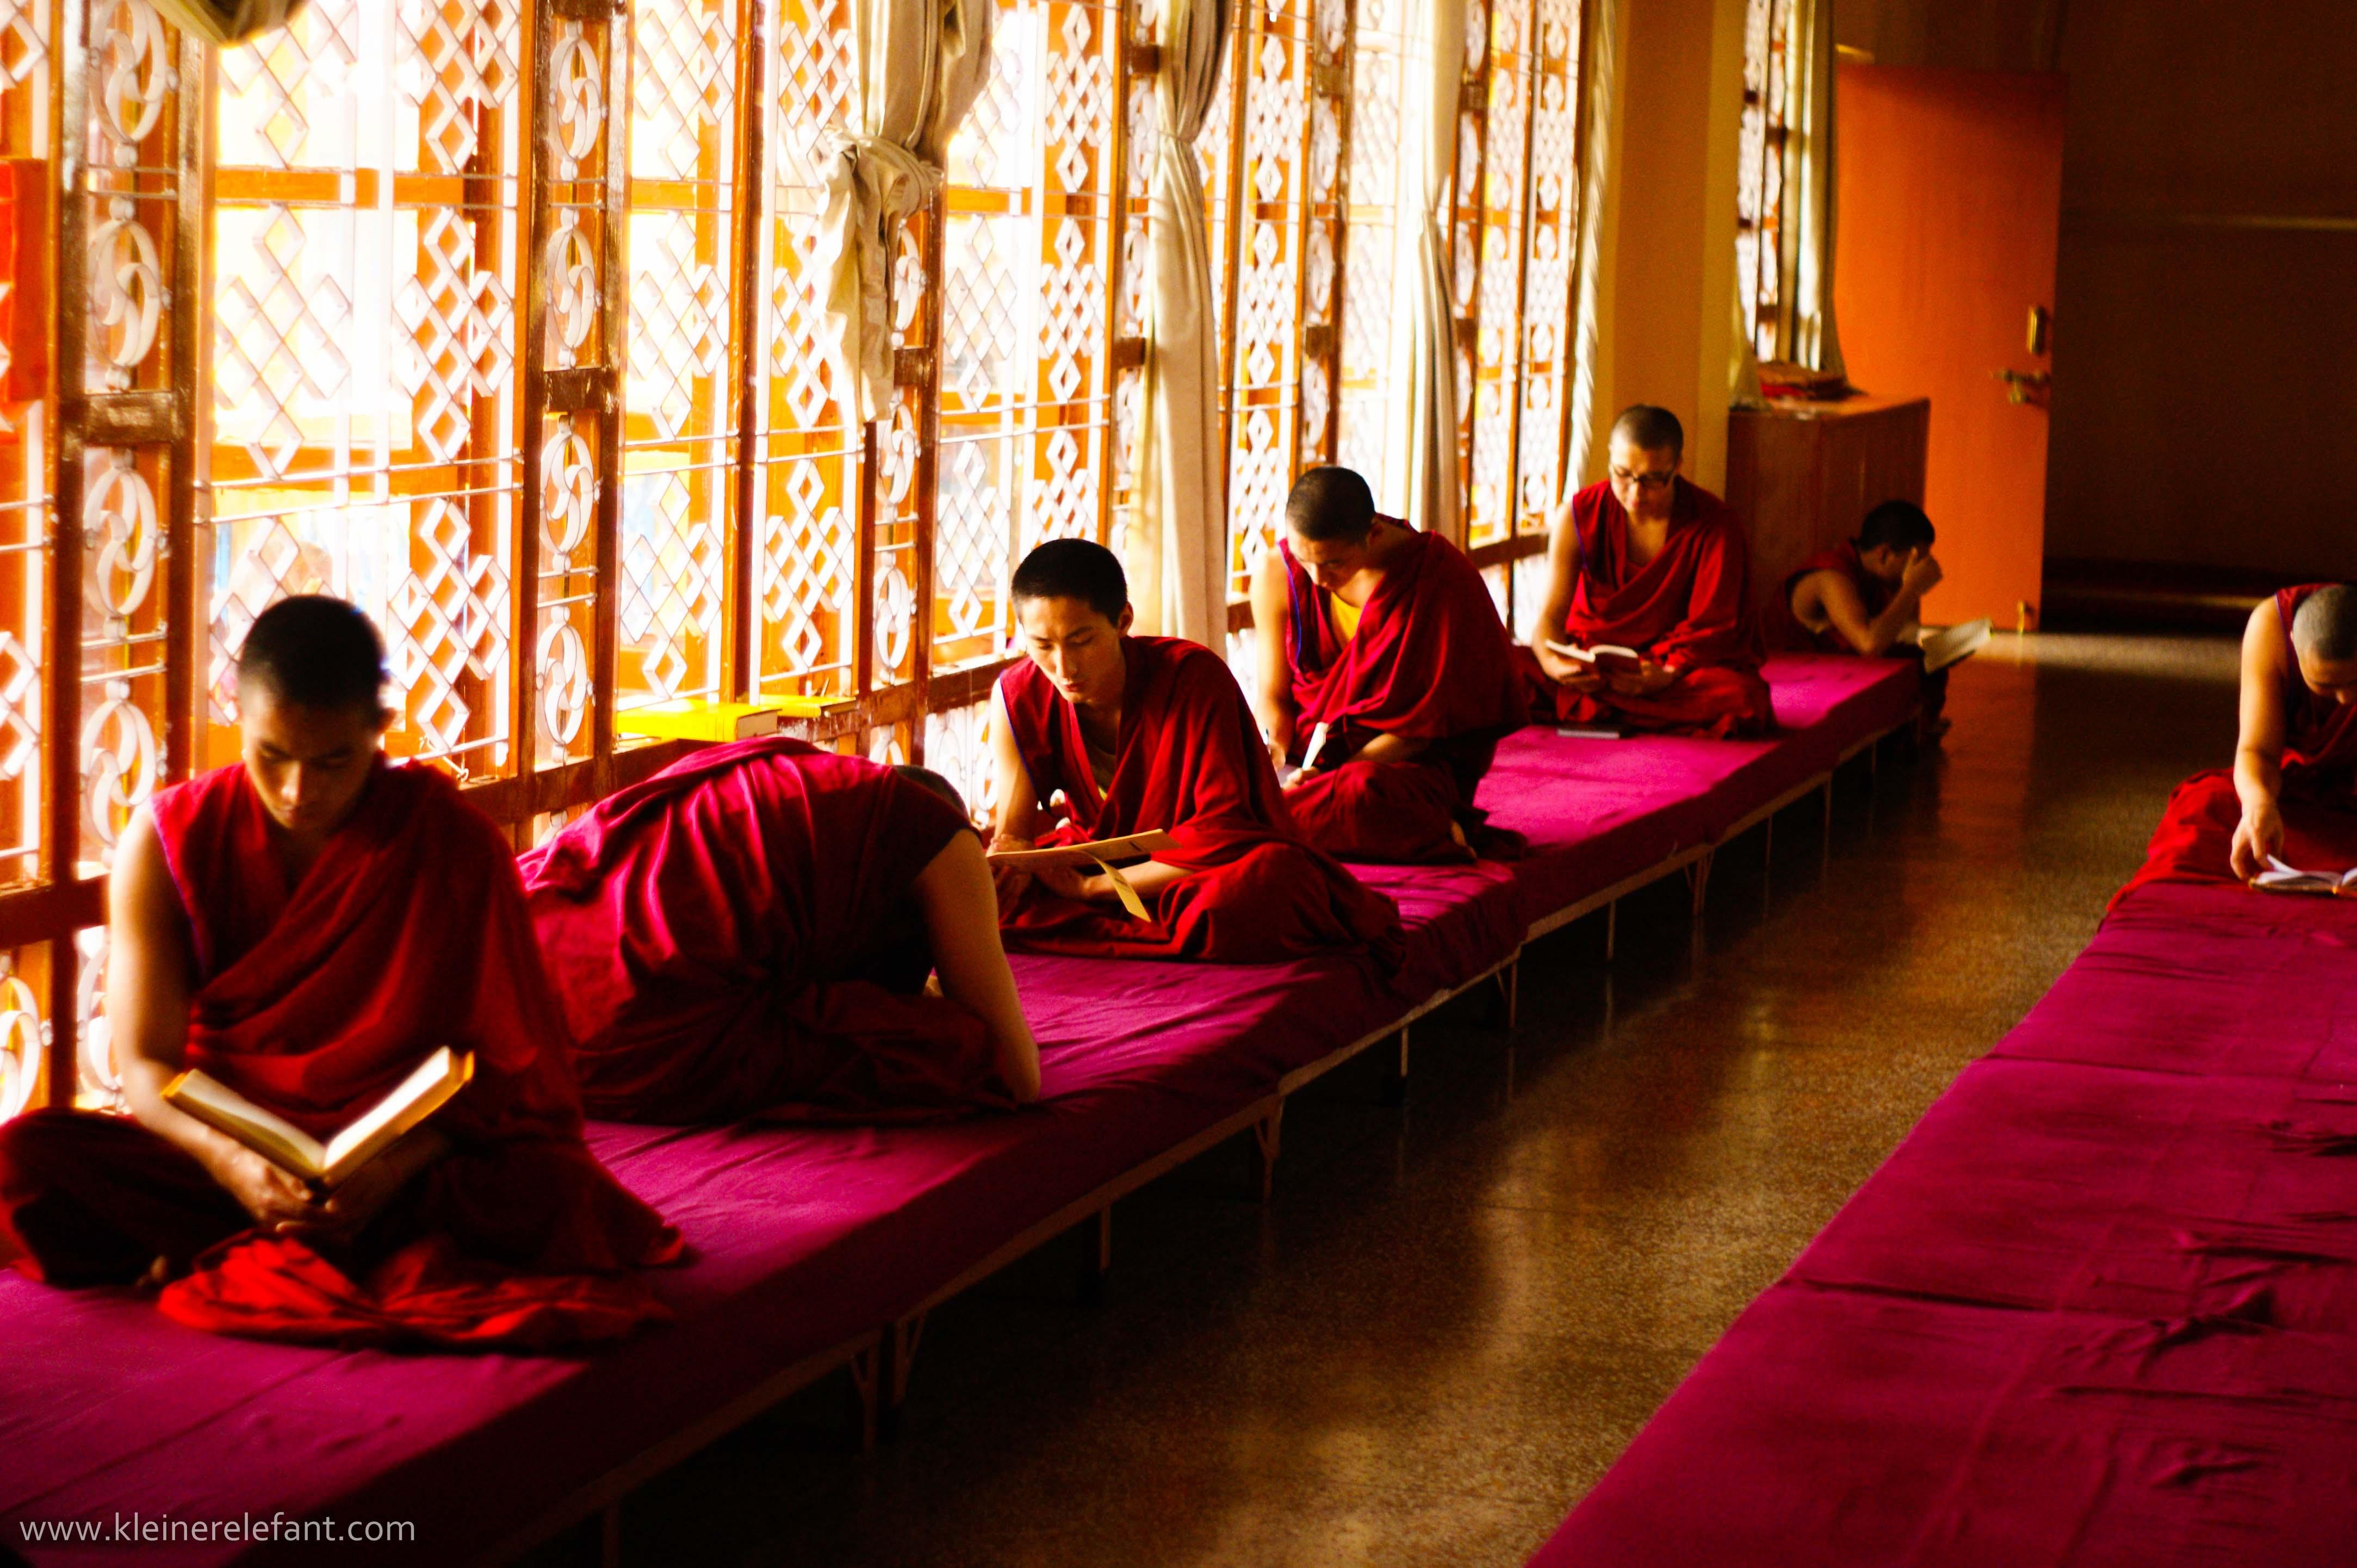 Mönche Dharamsala